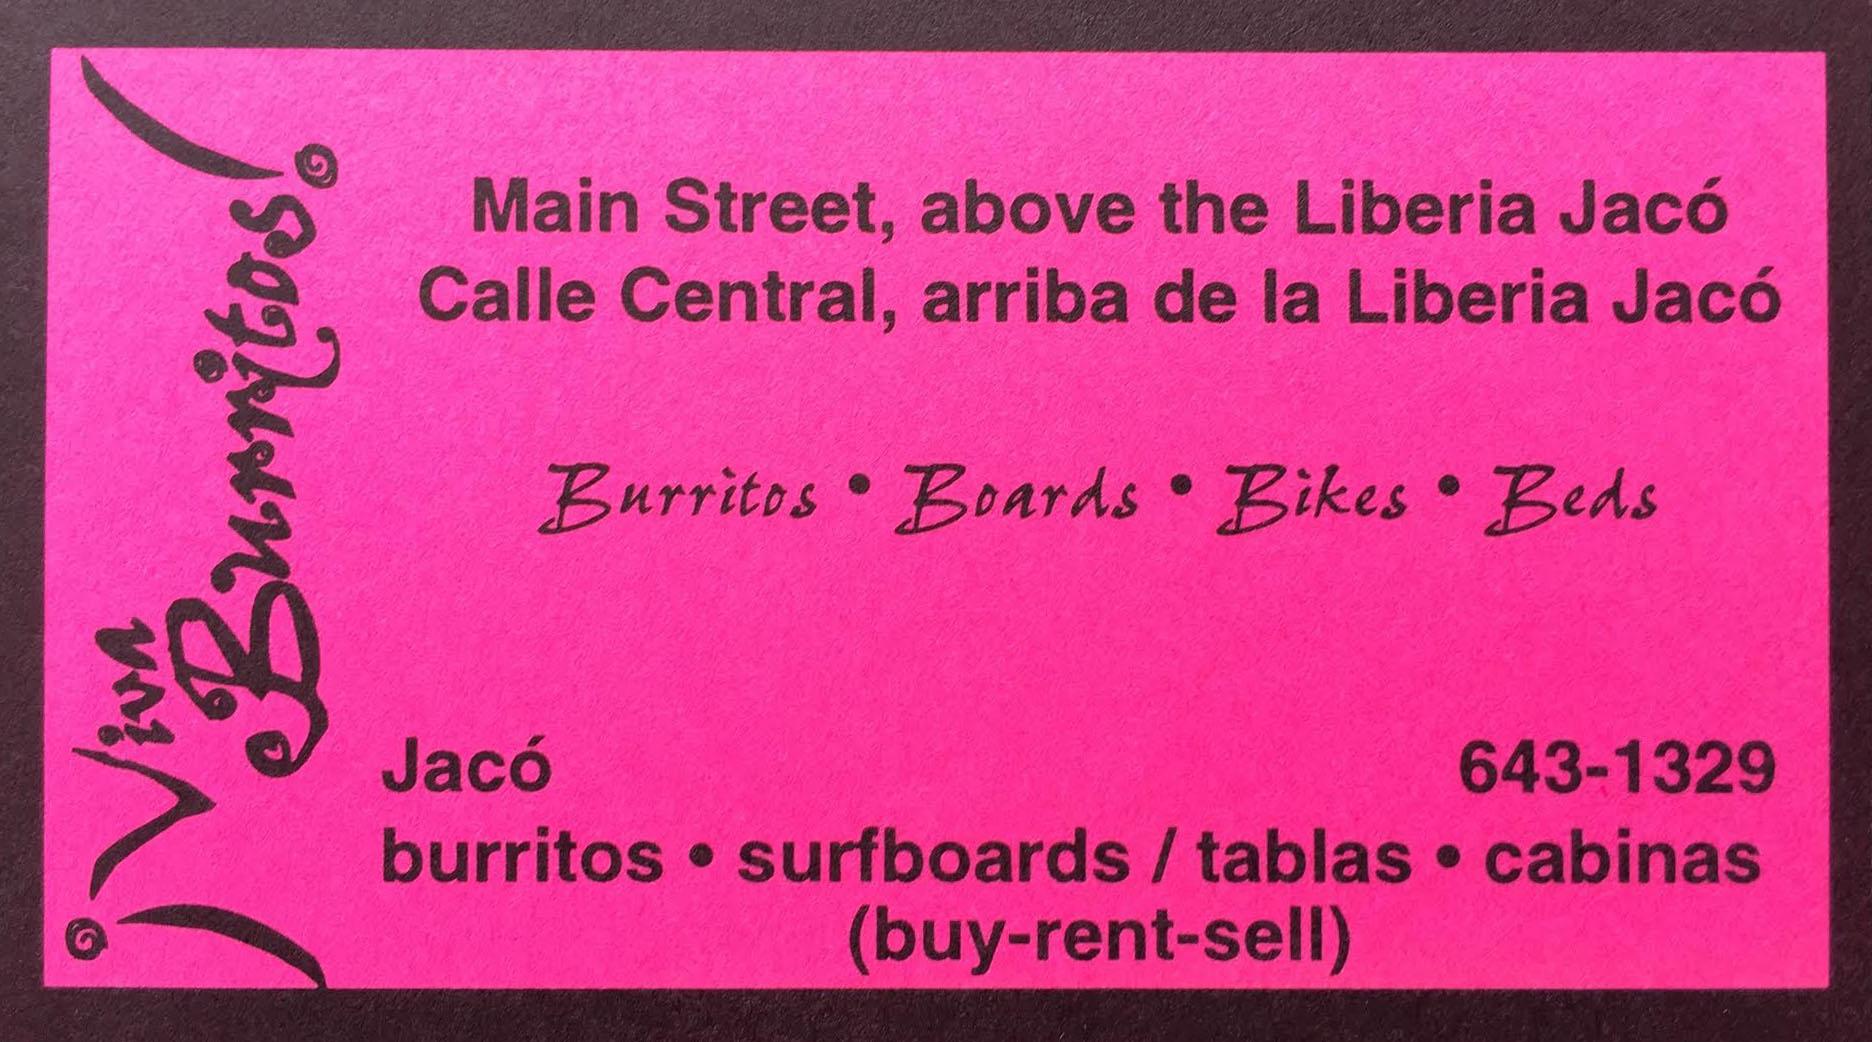 Viva Burritos Business Card